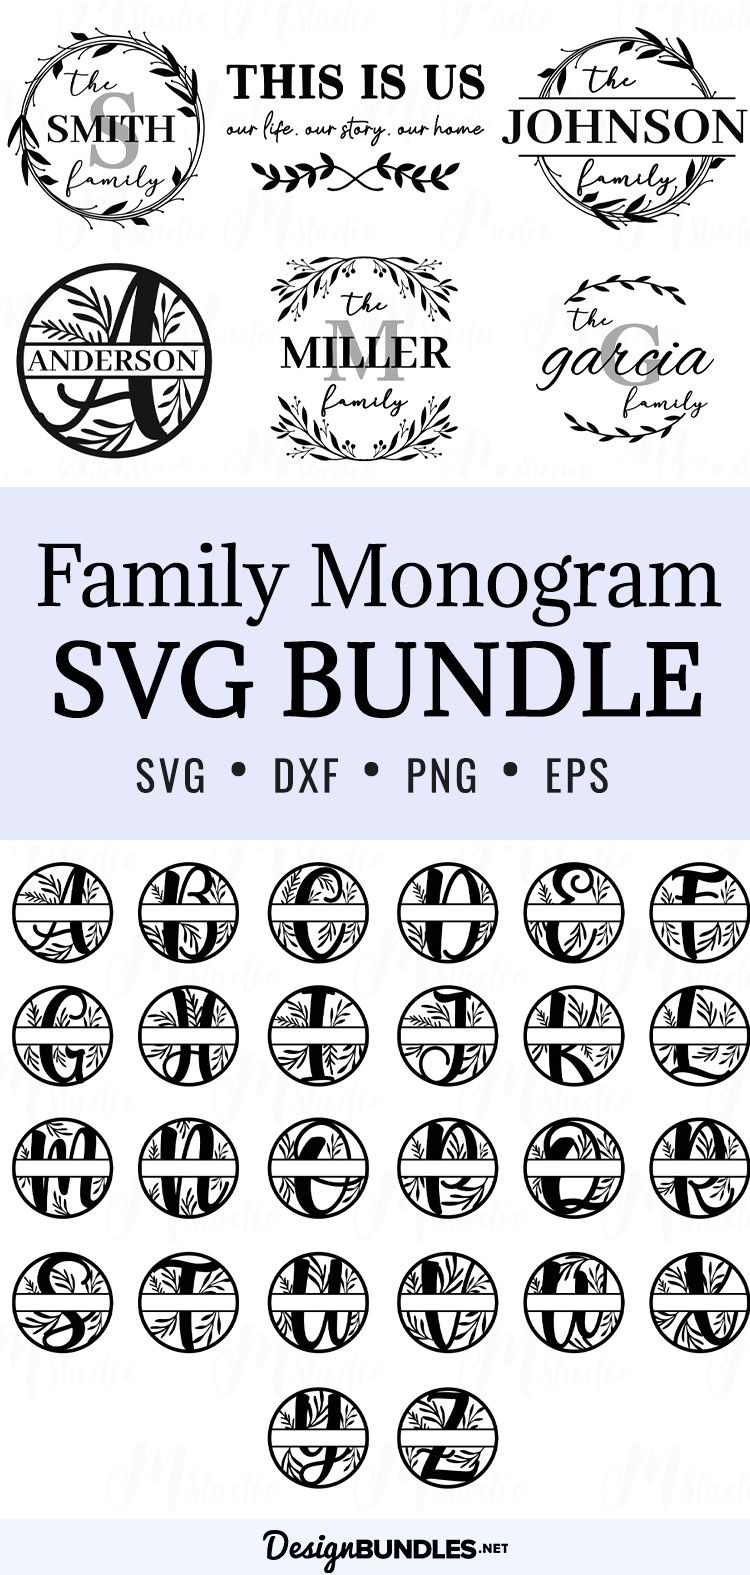 Download Pin On Svg Files Designs From Designbundles